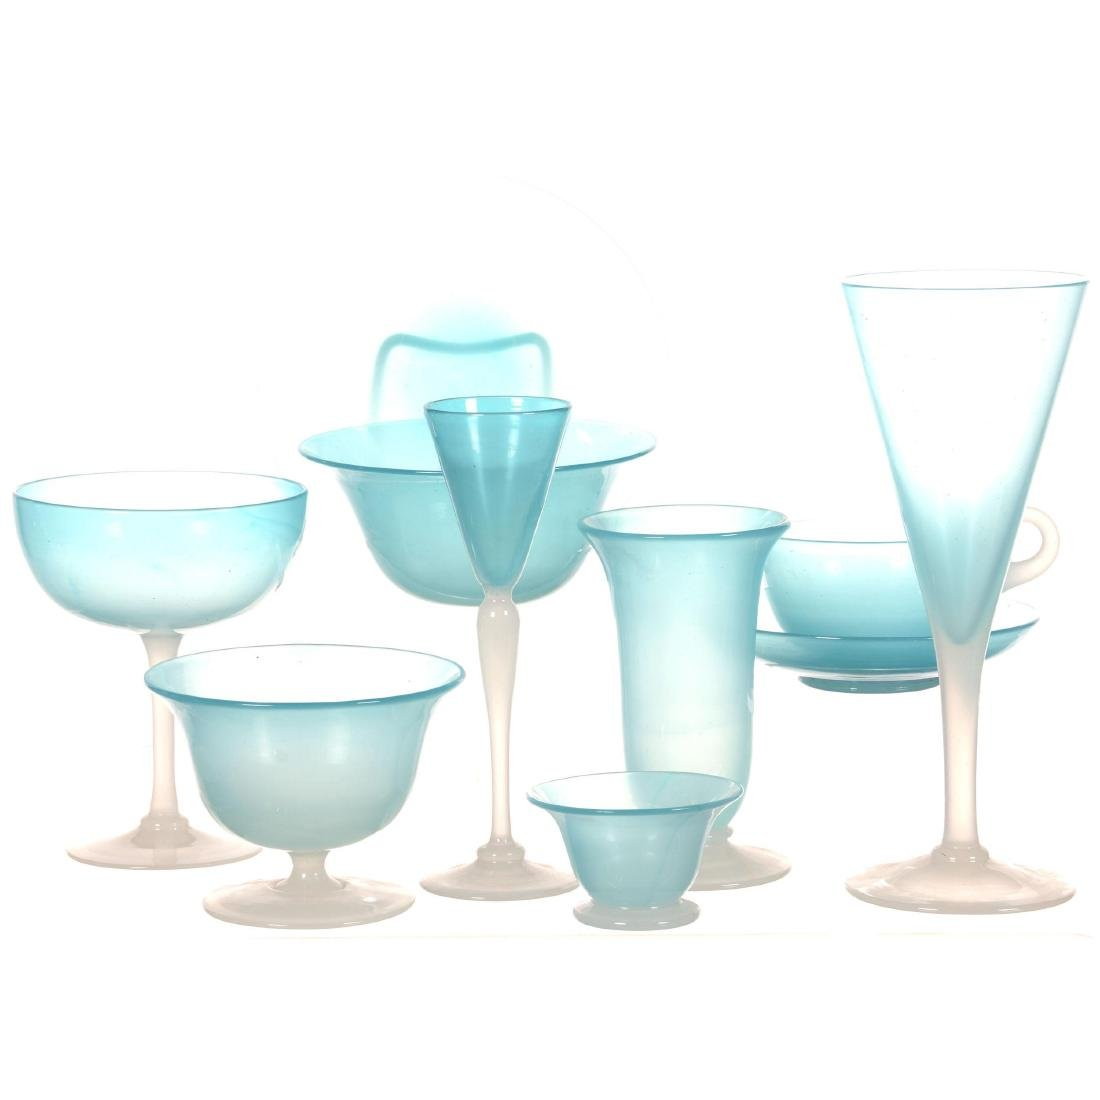 Fifty-Four Piece Set of Extremely Rare Light Blue Jade